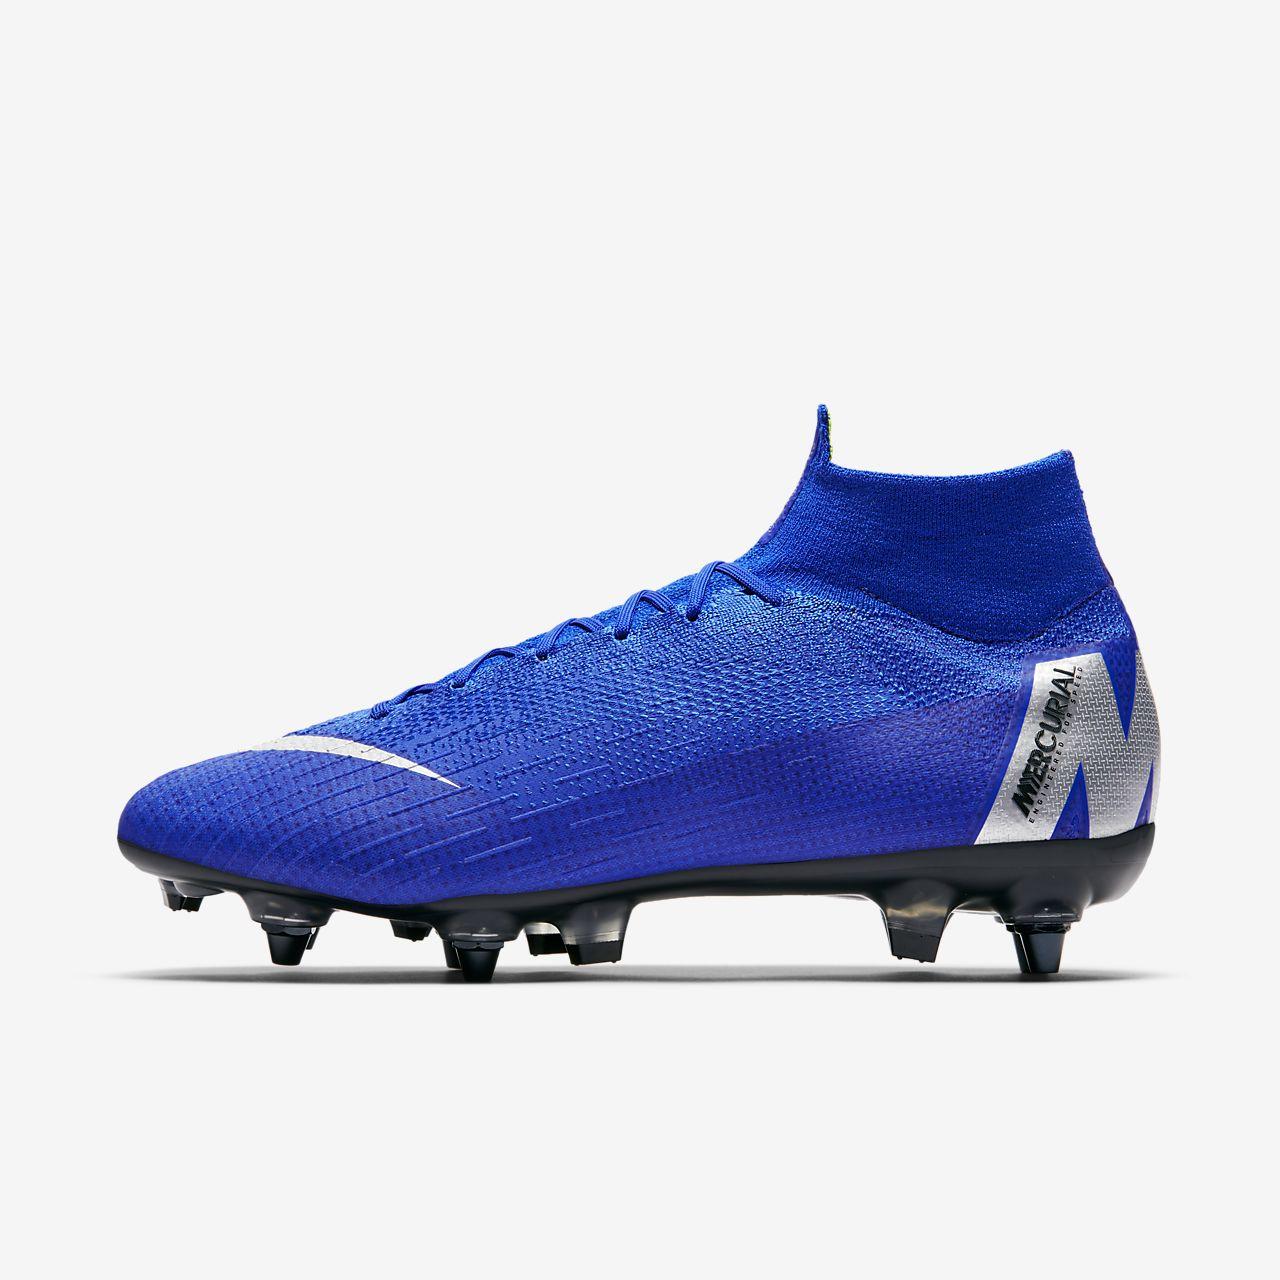 Nike Mercurial Superfly 360 Elite SG-PRO Anti-Clog Botas de fútbol para terreno blando